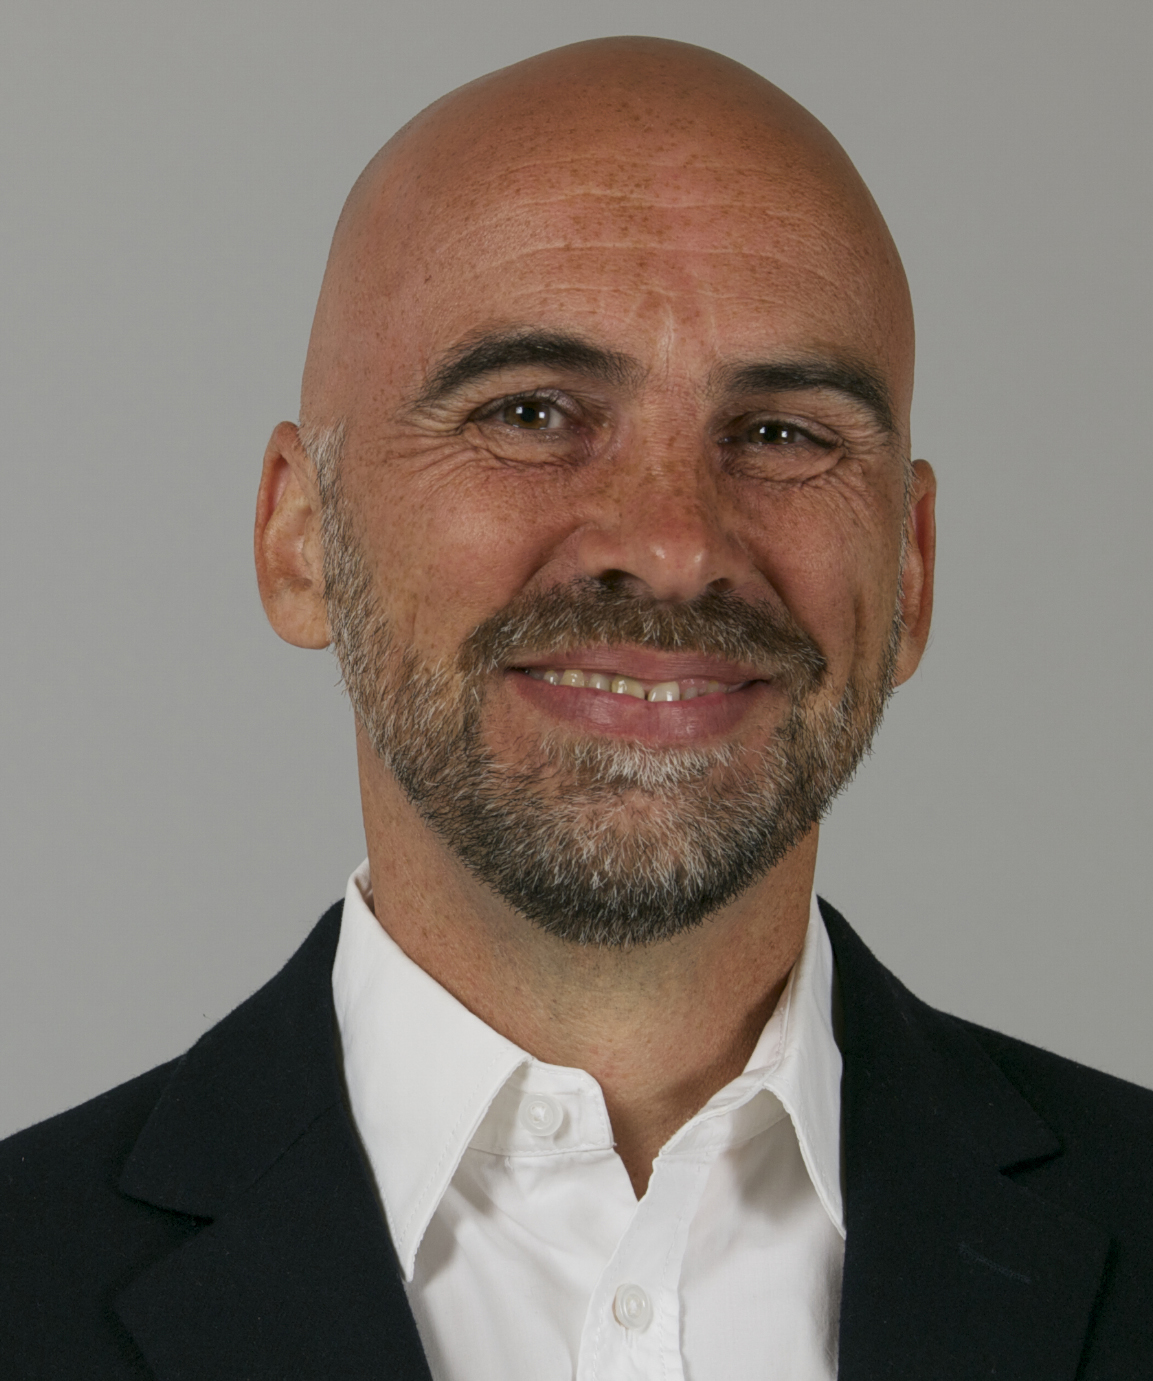 Dr. med. dent. Martin Chares